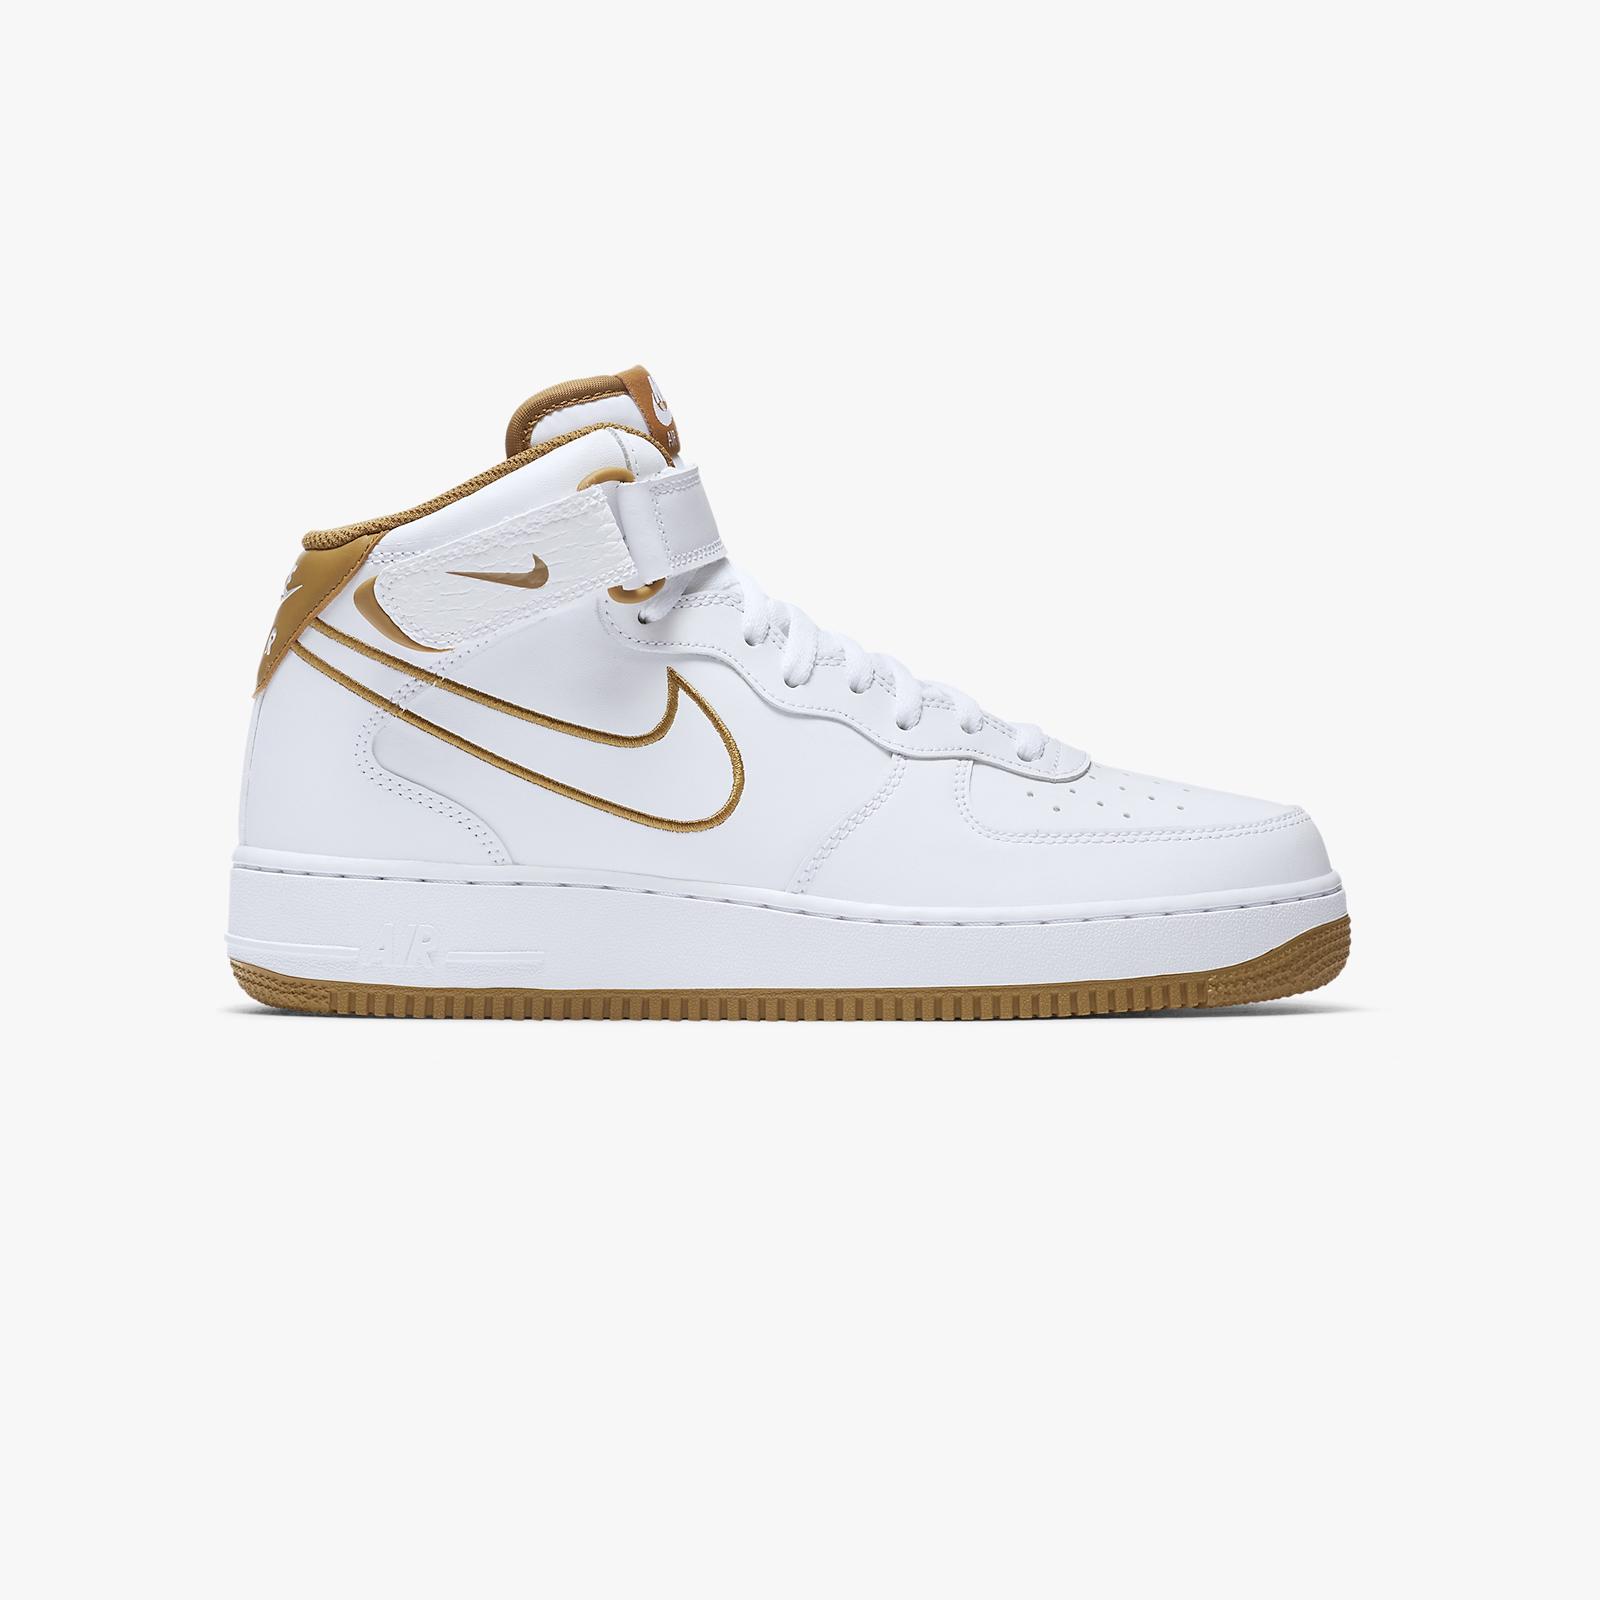 Mid Nike SneakersnstuffSneakers Air 07 101 1 Aq8650 Force m8yn0NOvw